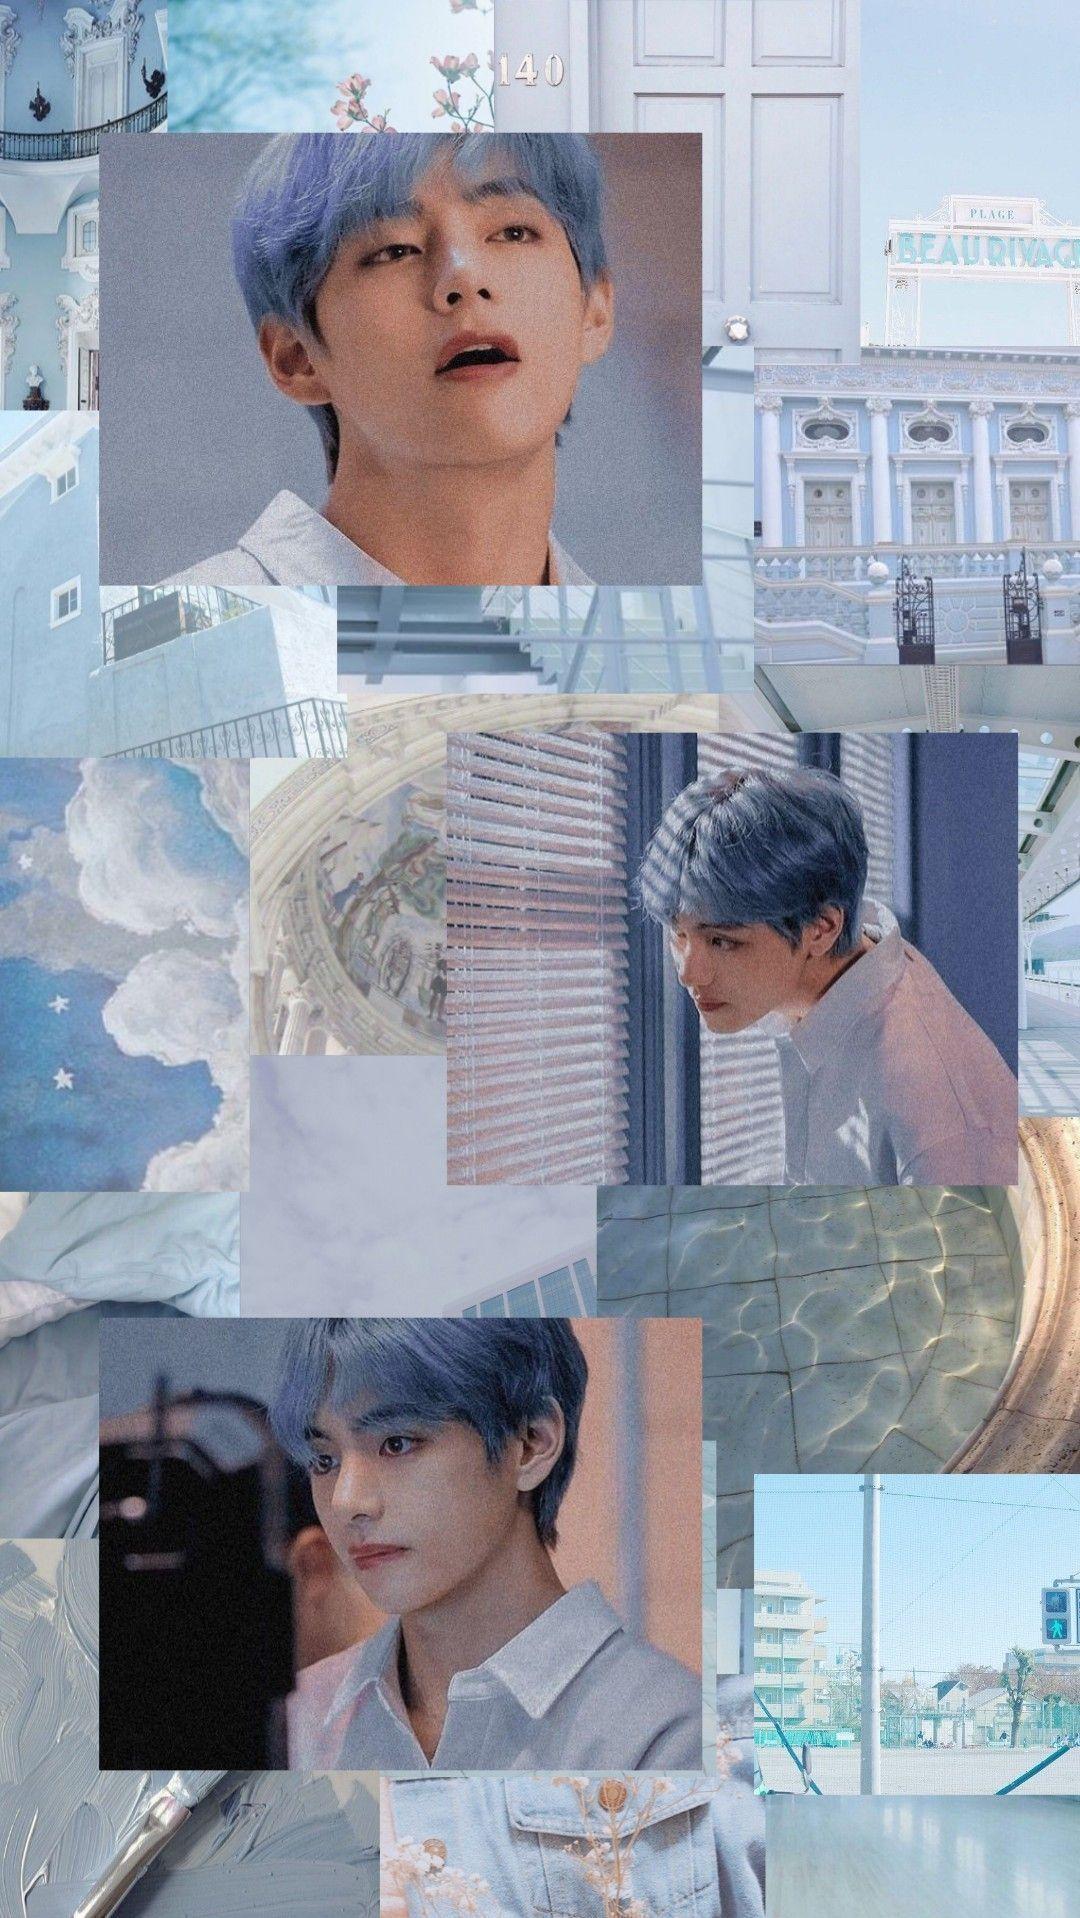 Fond D Ecran Kim Taehyung In 2020 Kim Taehyung Wallpaper Bts Aesthetic Wallpaper For Phone Bts Wallpaper